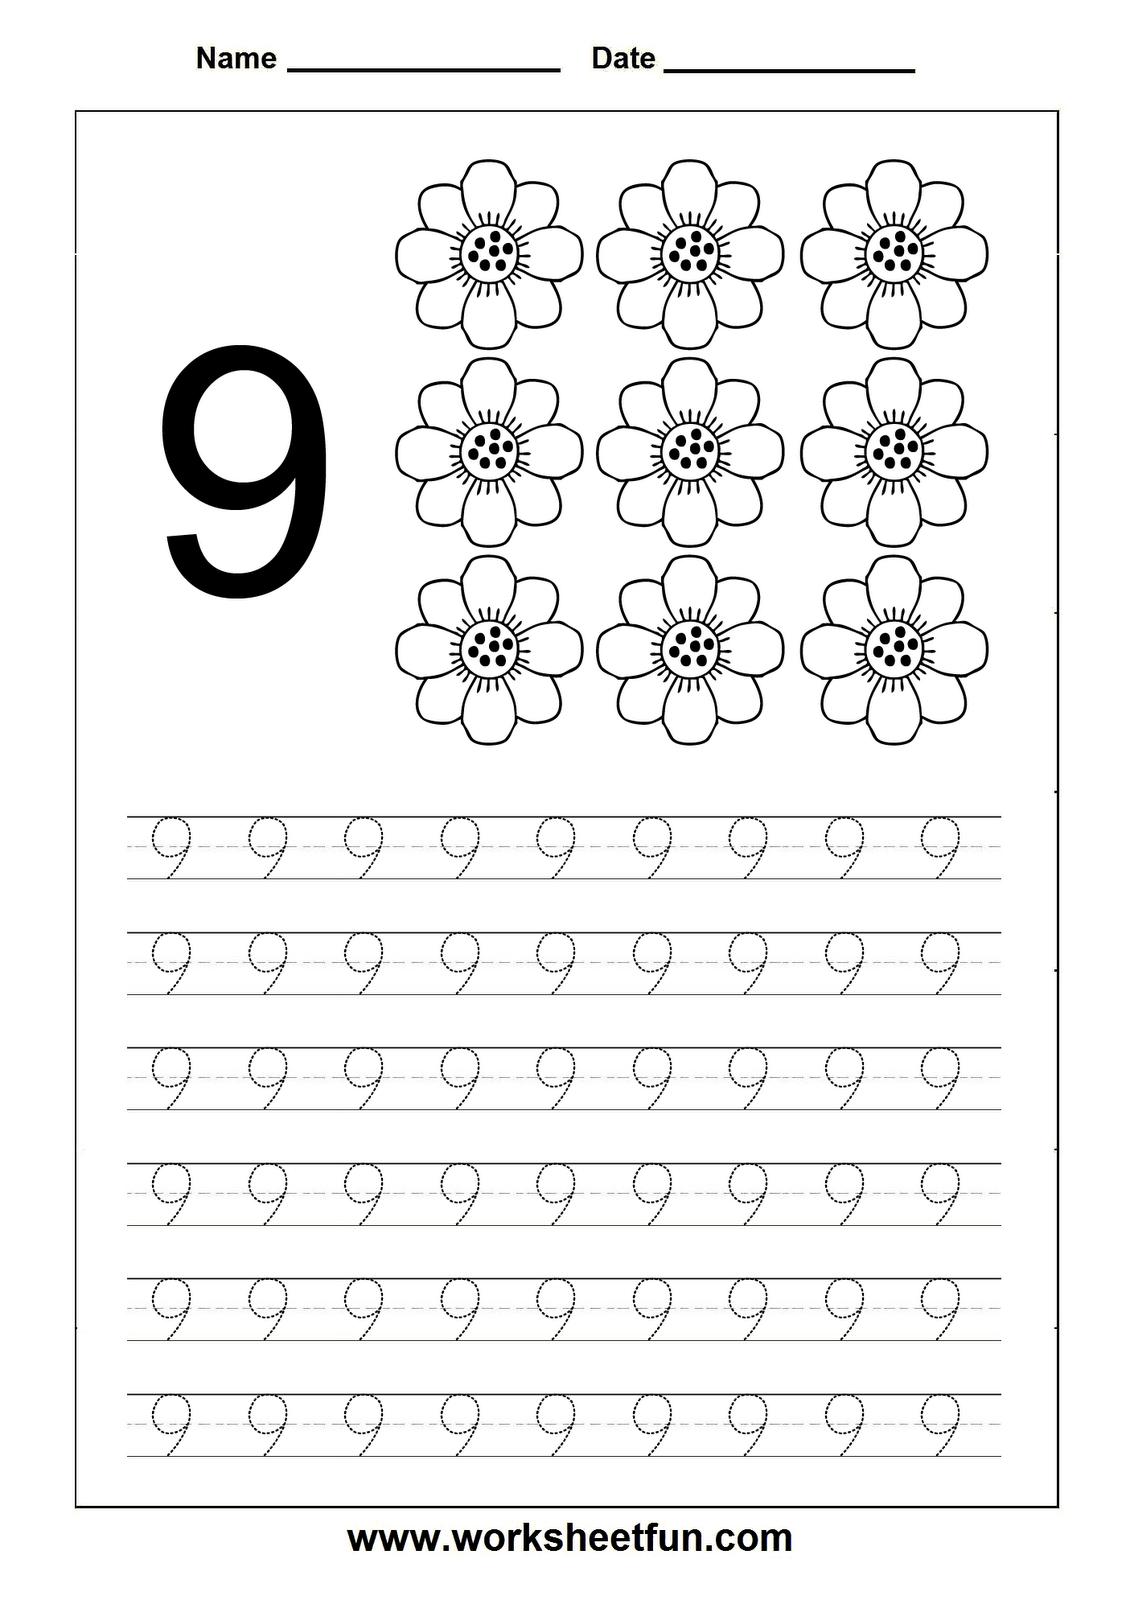 Number Tracing worksheet - 9 | Fișe ptr. preșcolari | Pinterest ...